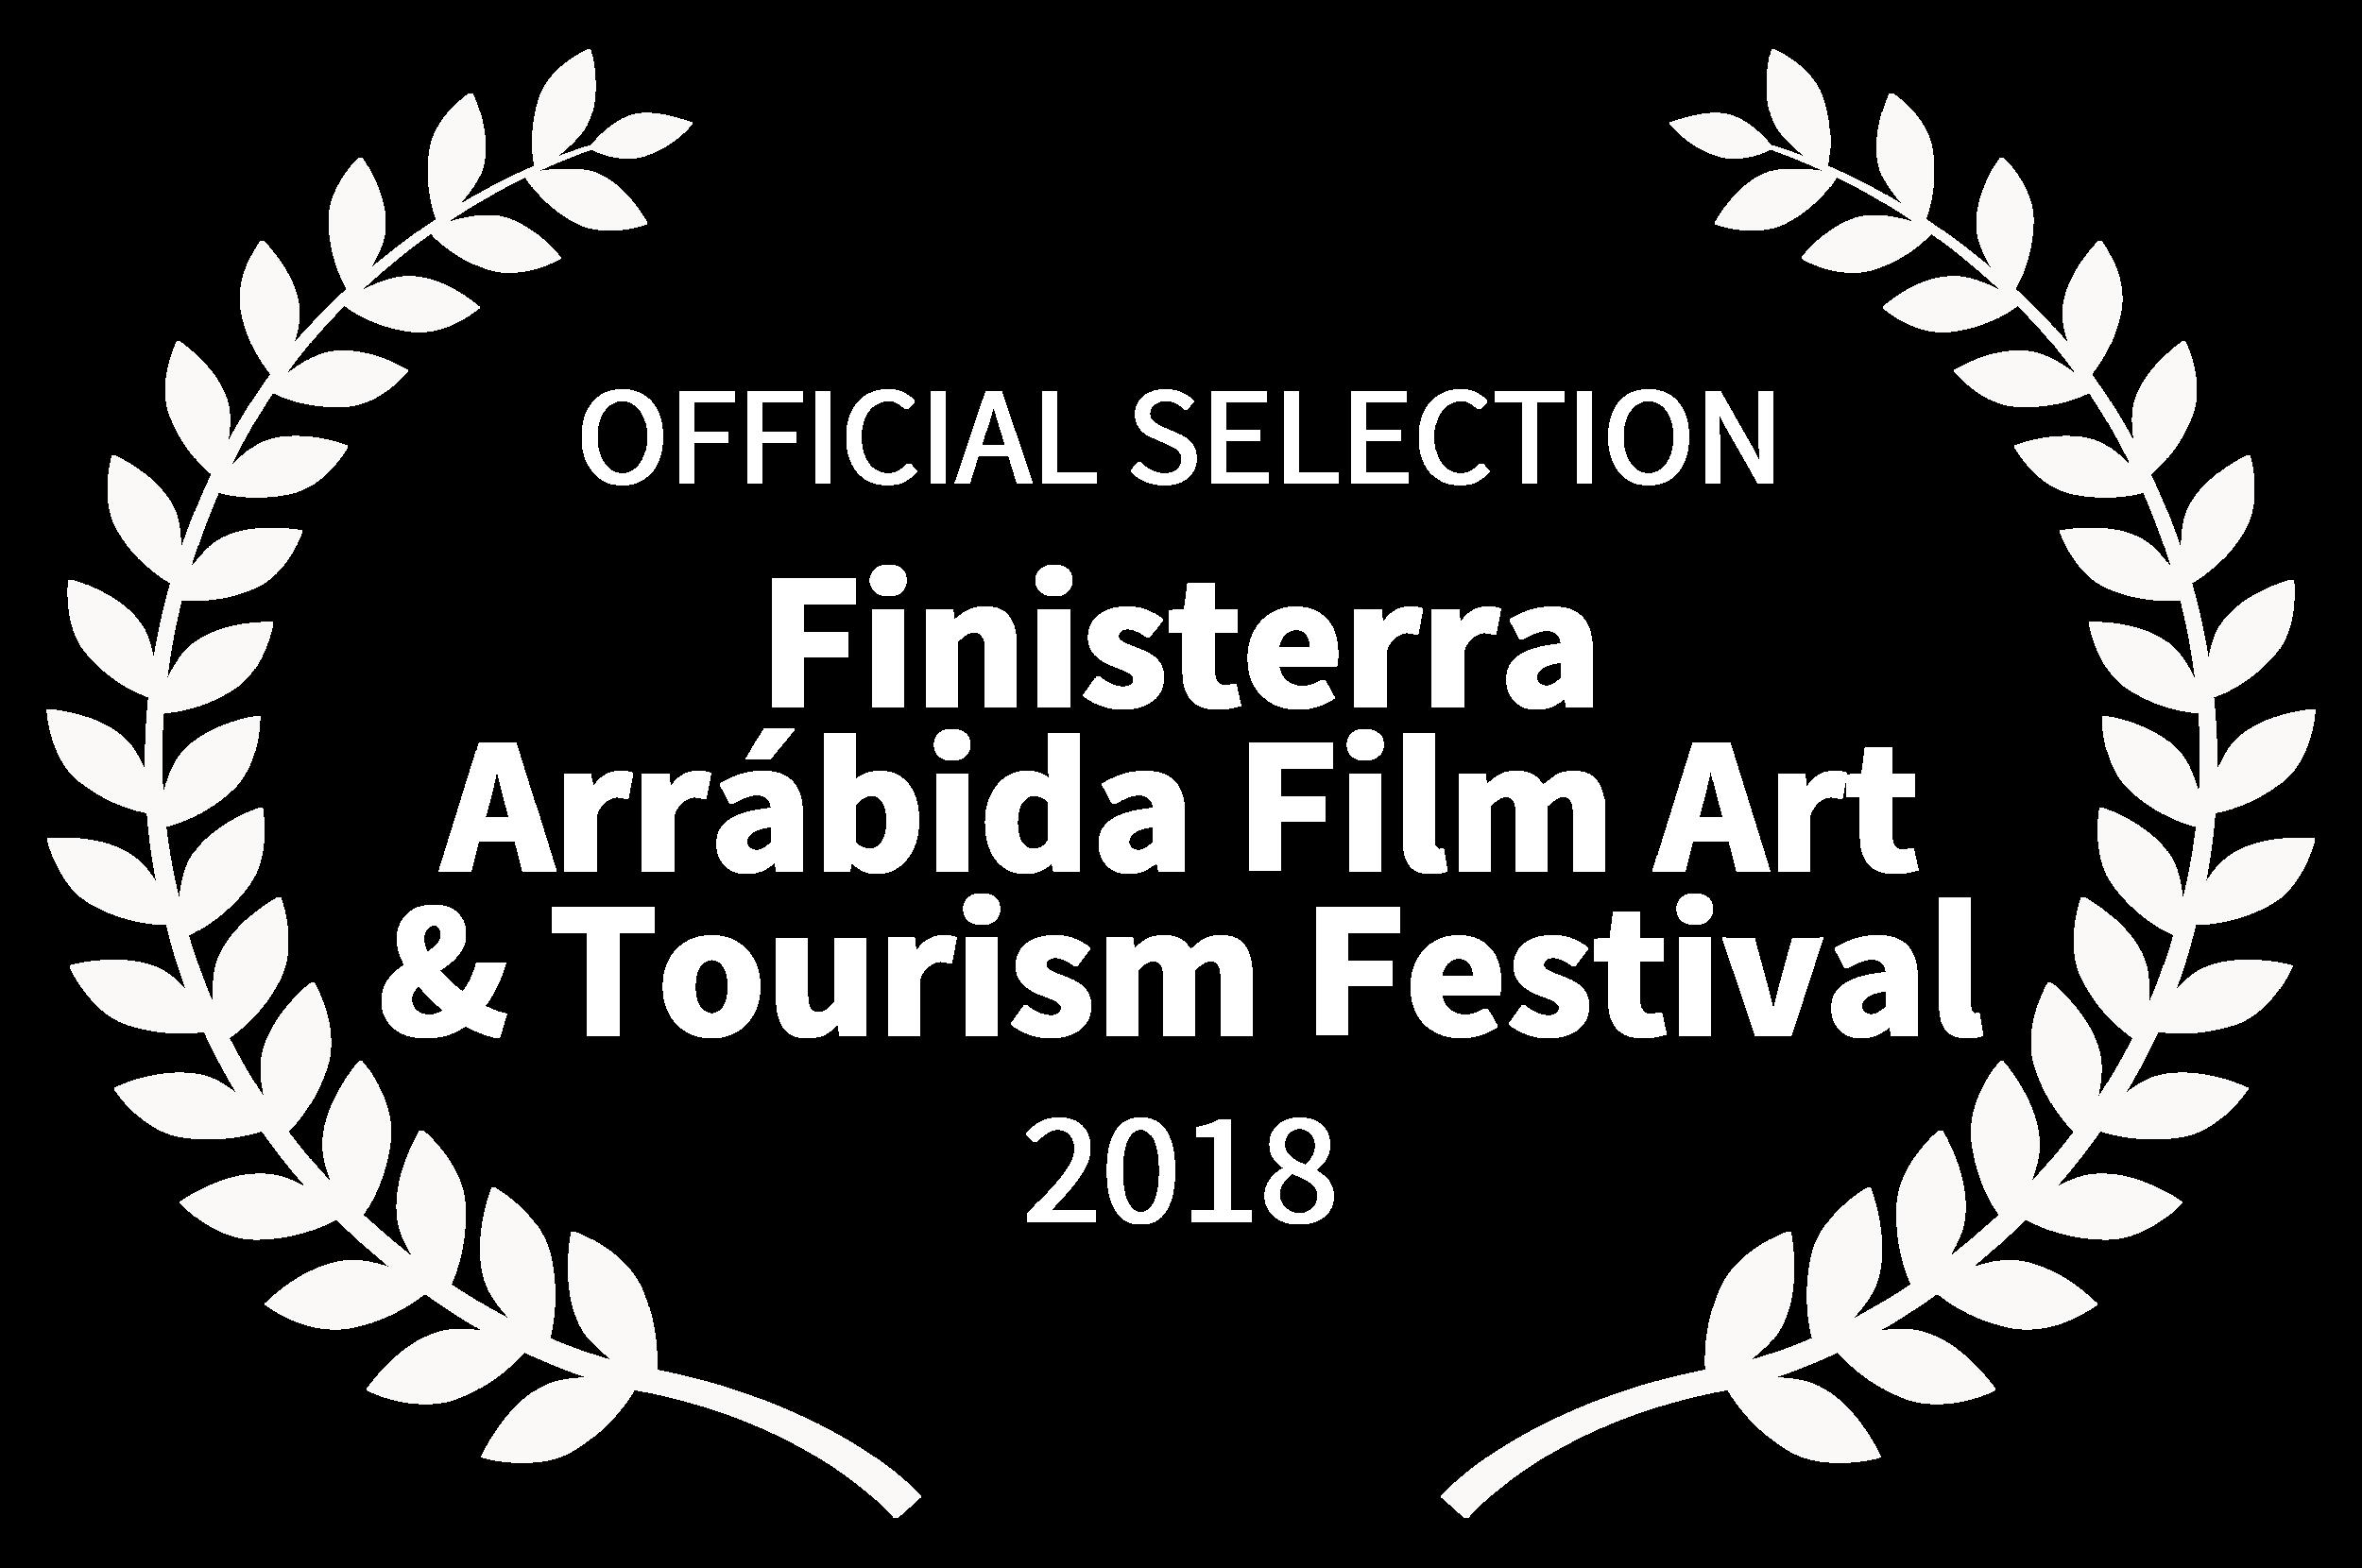 OFFICIALSELECTION-FinisterraArrbidaFilmArtTourismFestival-2018 copy.png